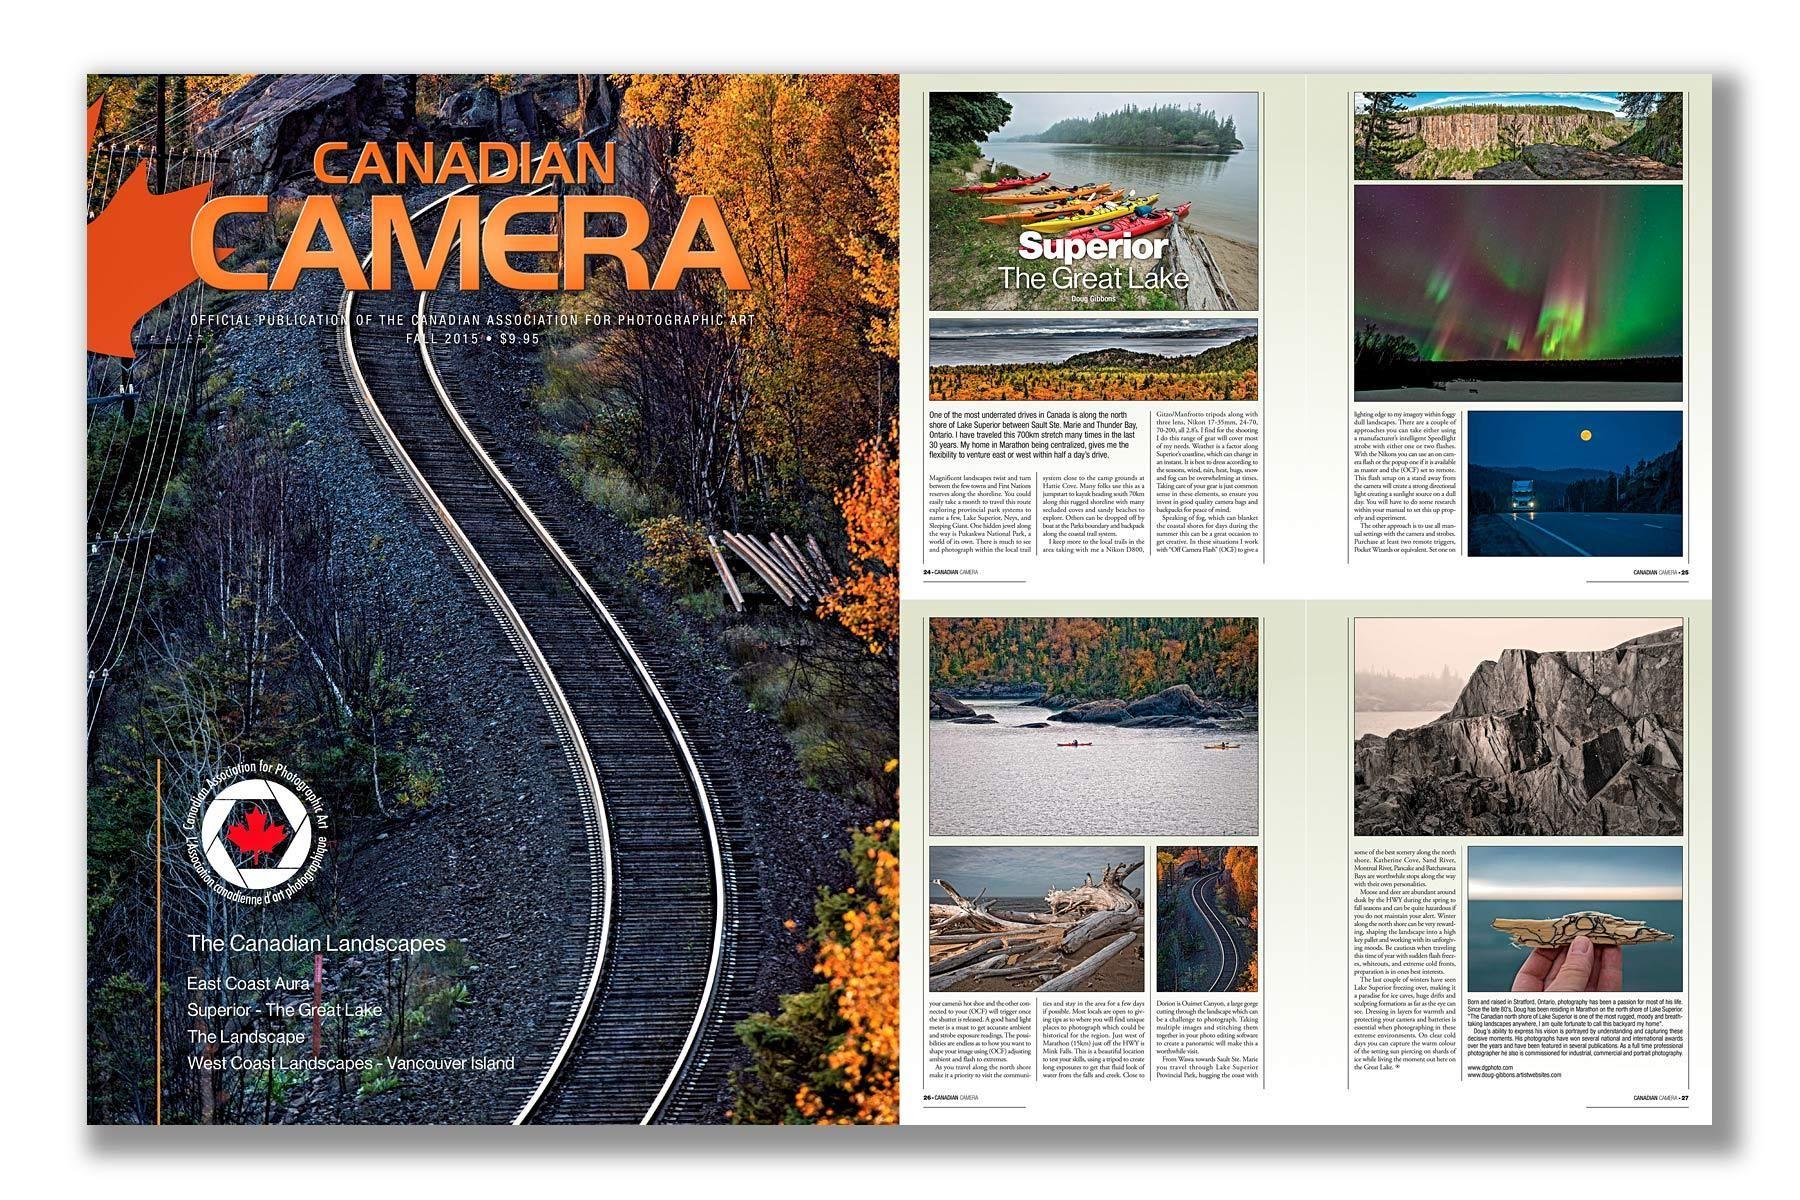 Canadian Camera Magazine